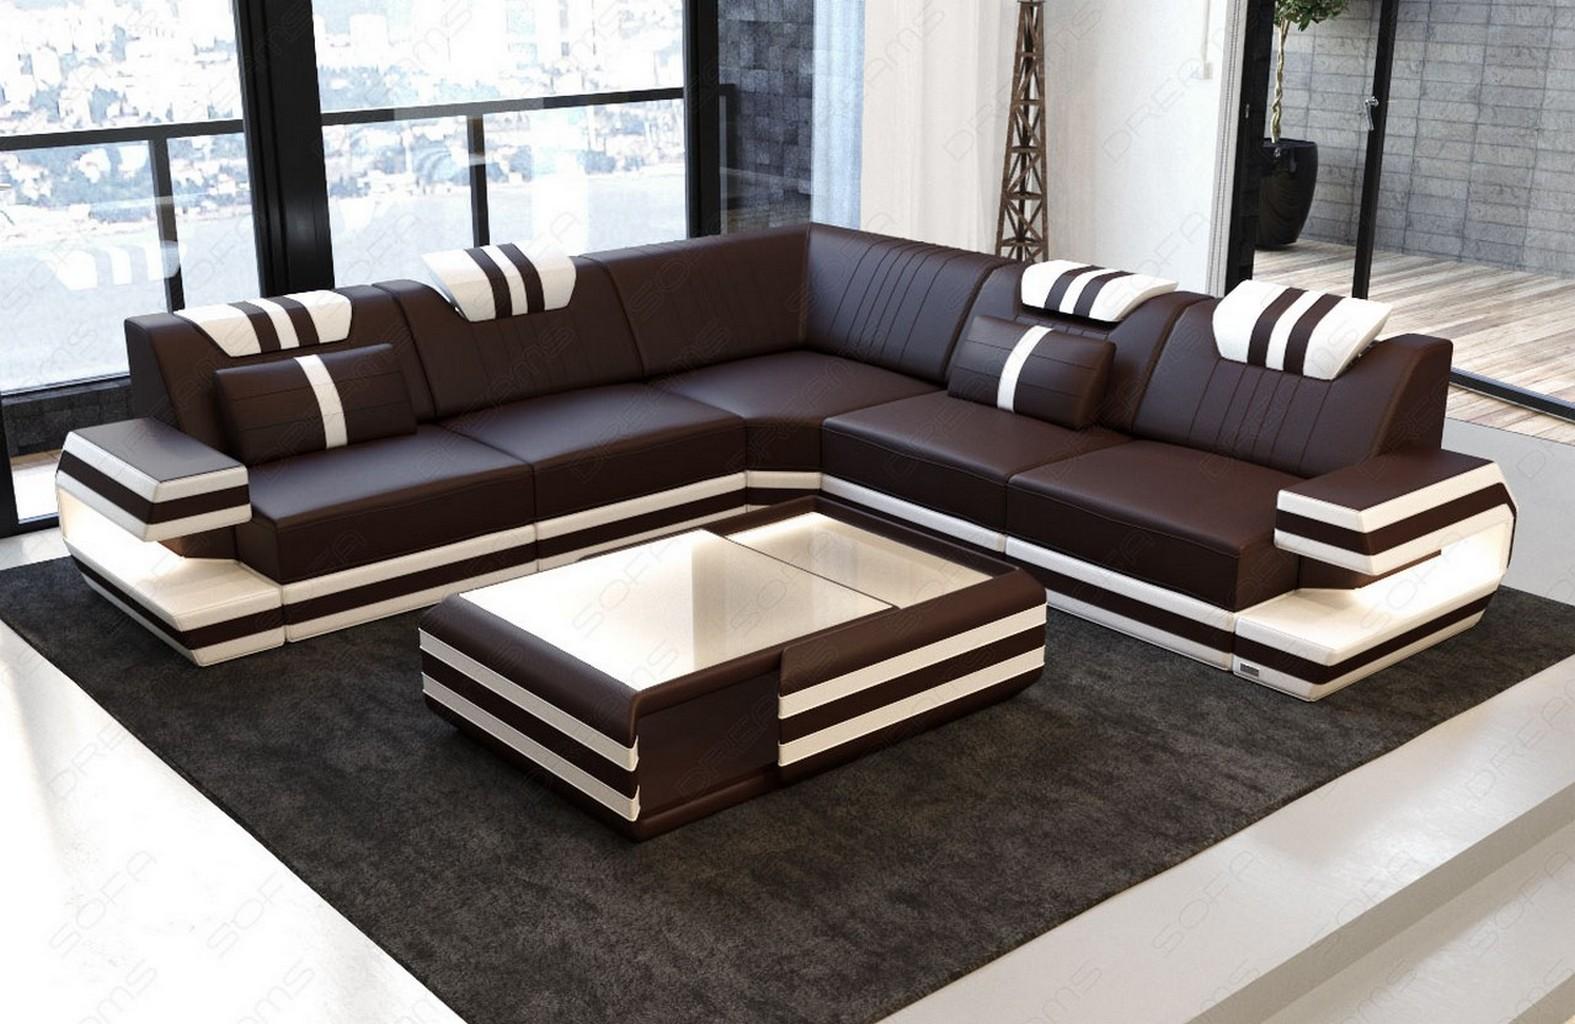 design sofa couch modern ragusa l form lounge ottoman. Black Bedroom Furniture Sets. Home Design Ideas